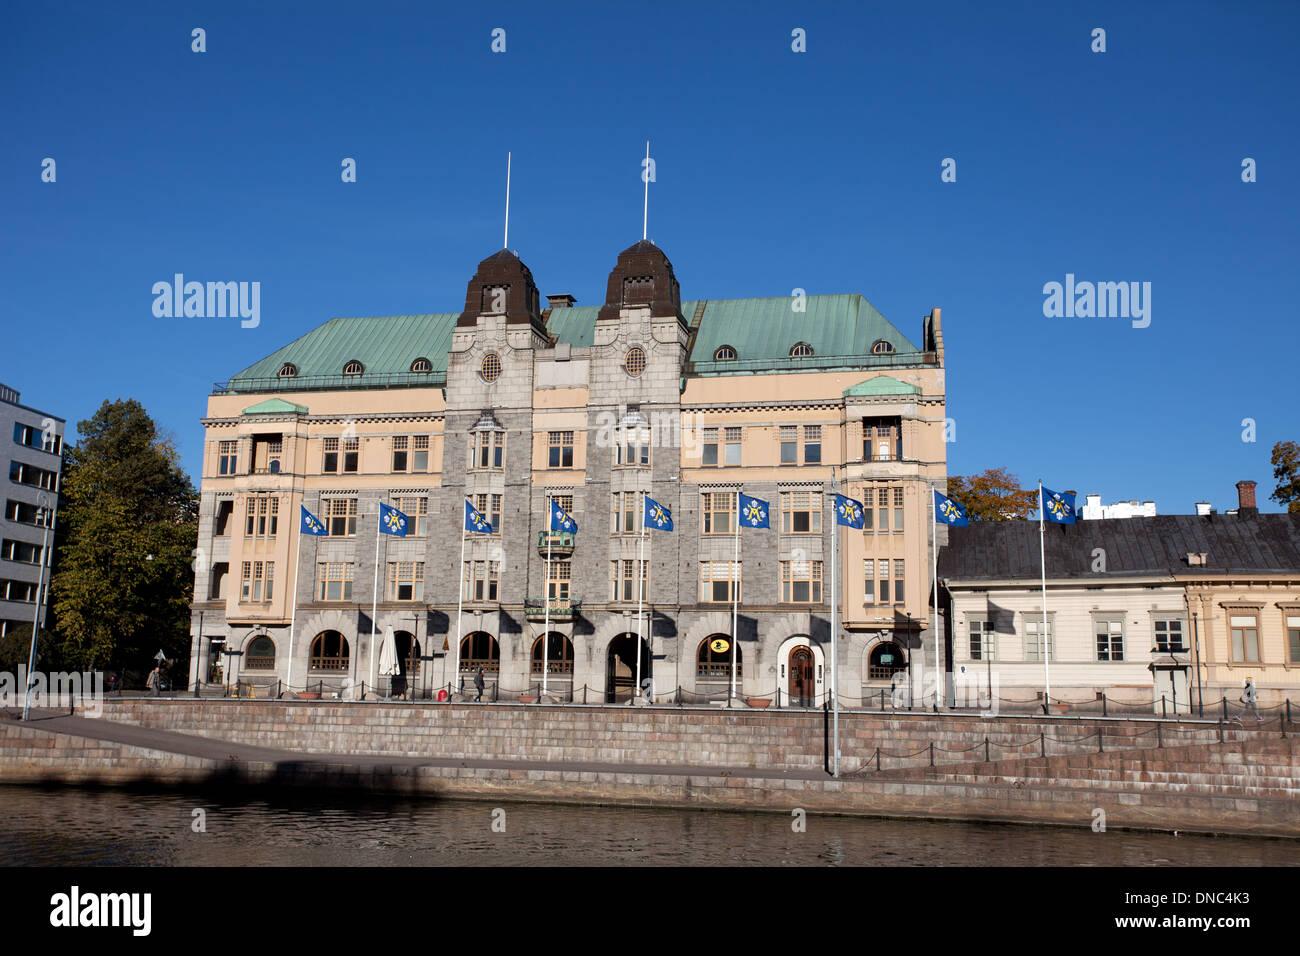 Turku: Aura River View - Stock Image